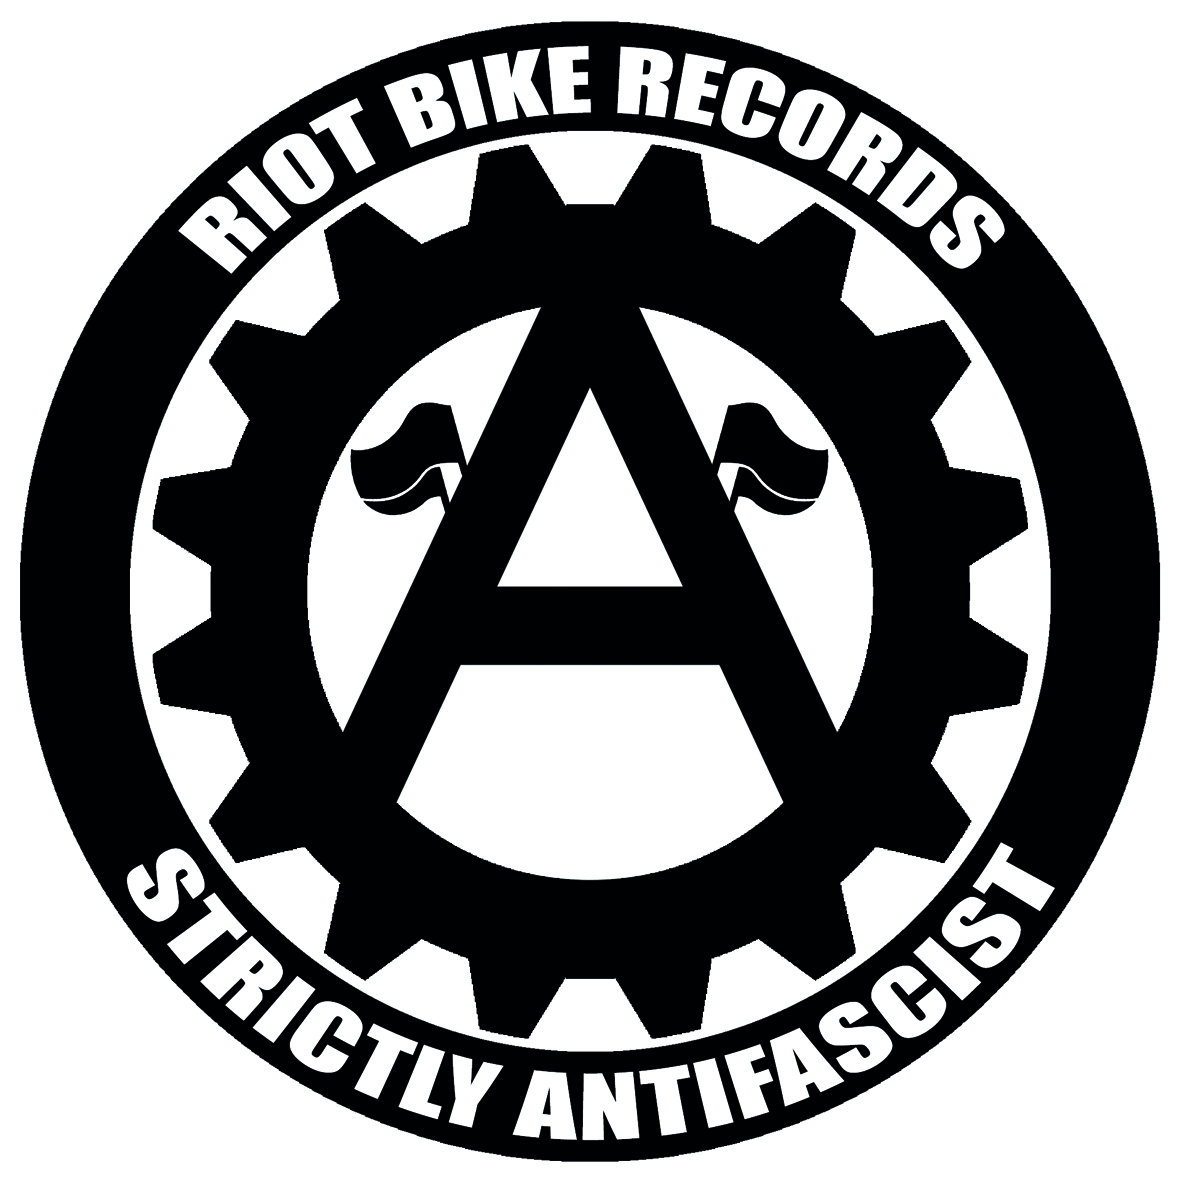 Gloomster ngel mit kpfen rbr 015 riot bike records riot bike records image buycottarizona